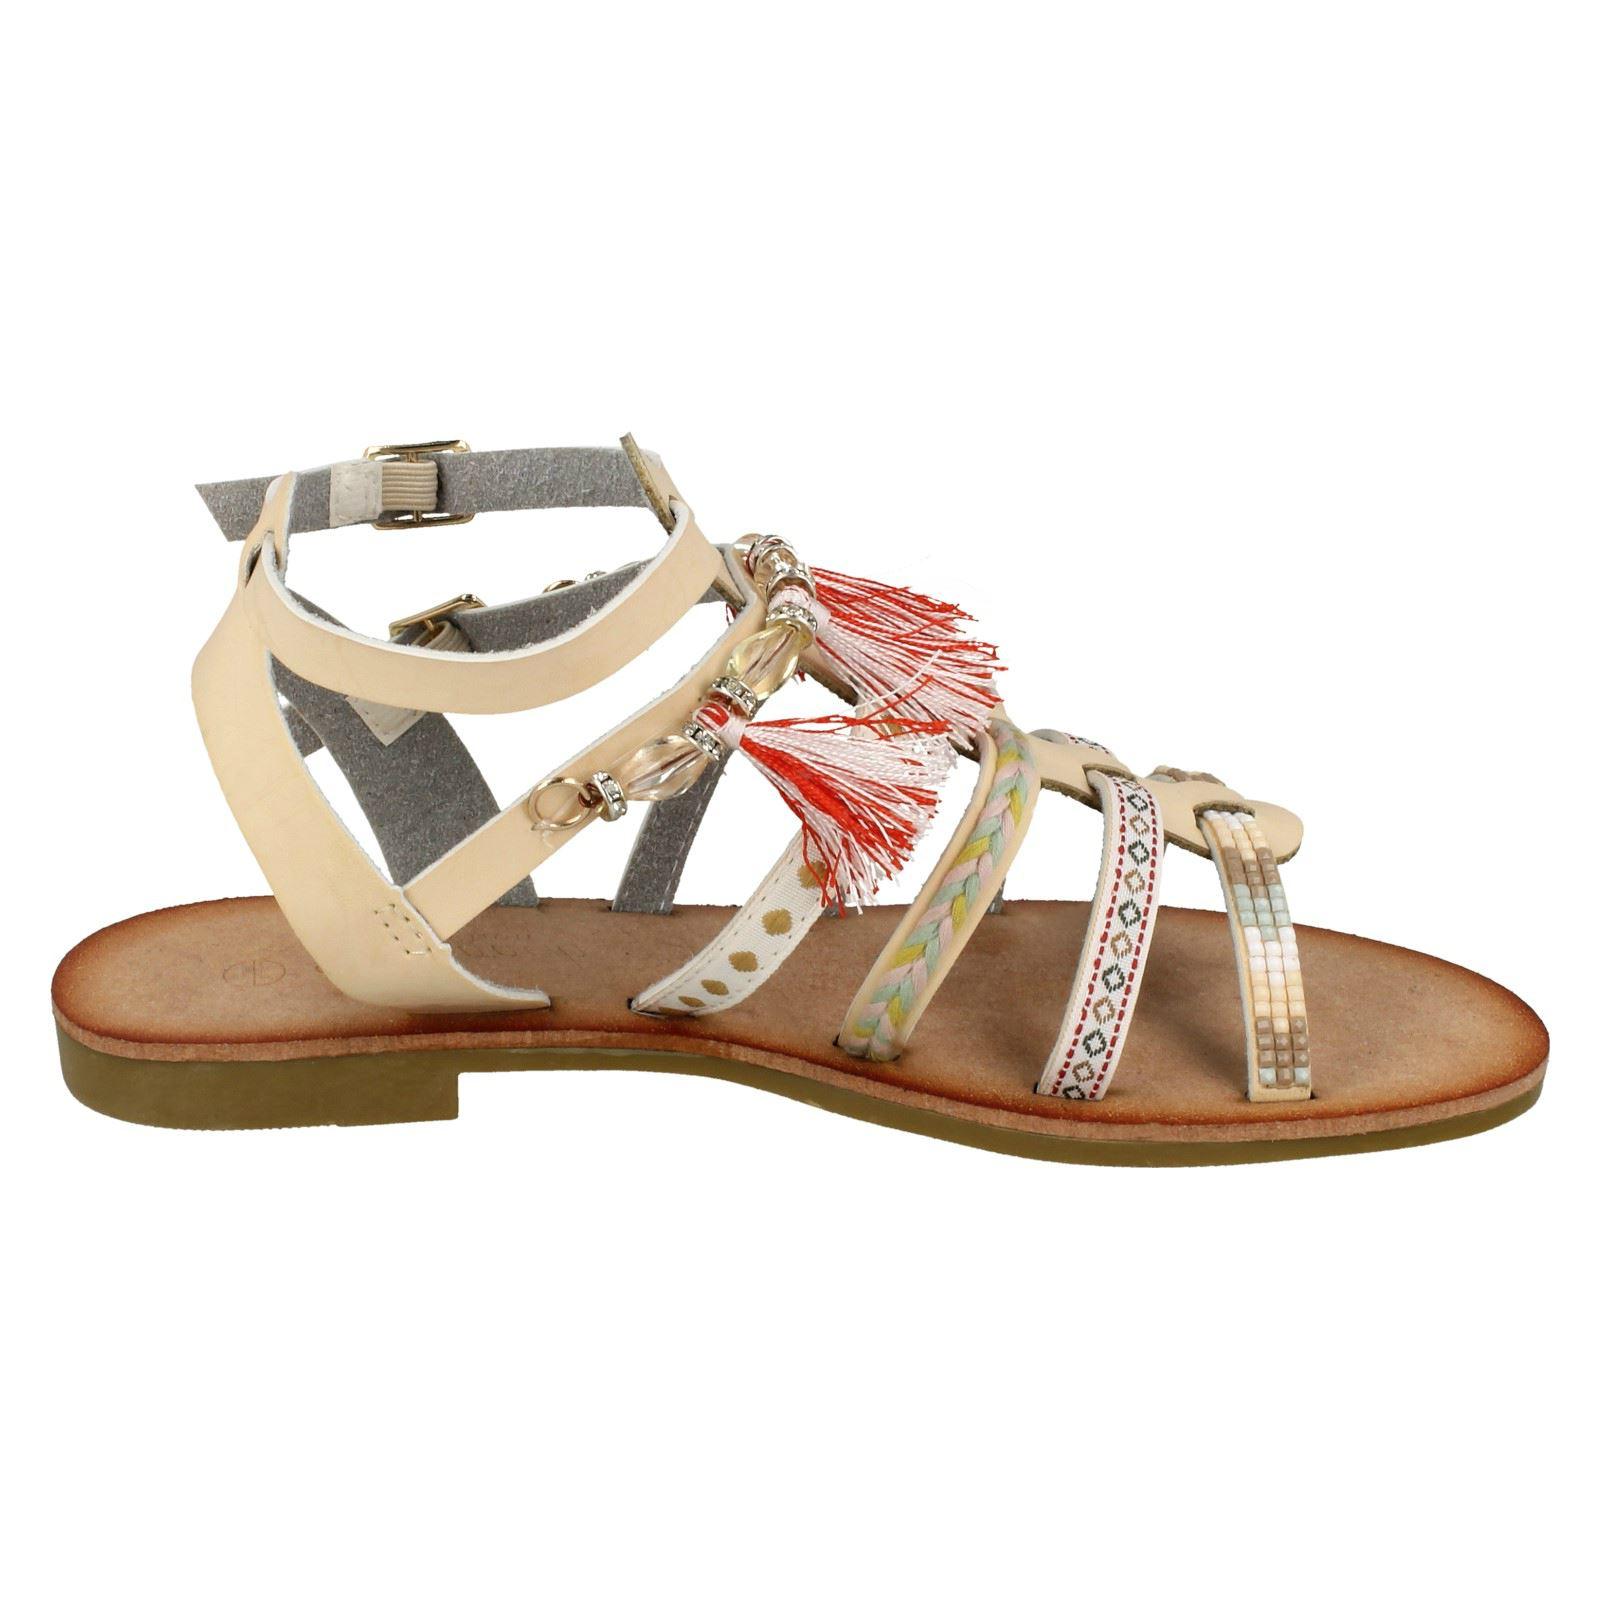 Ladies Savannah Flat Strappy Beaded 'Sandals'   eBay